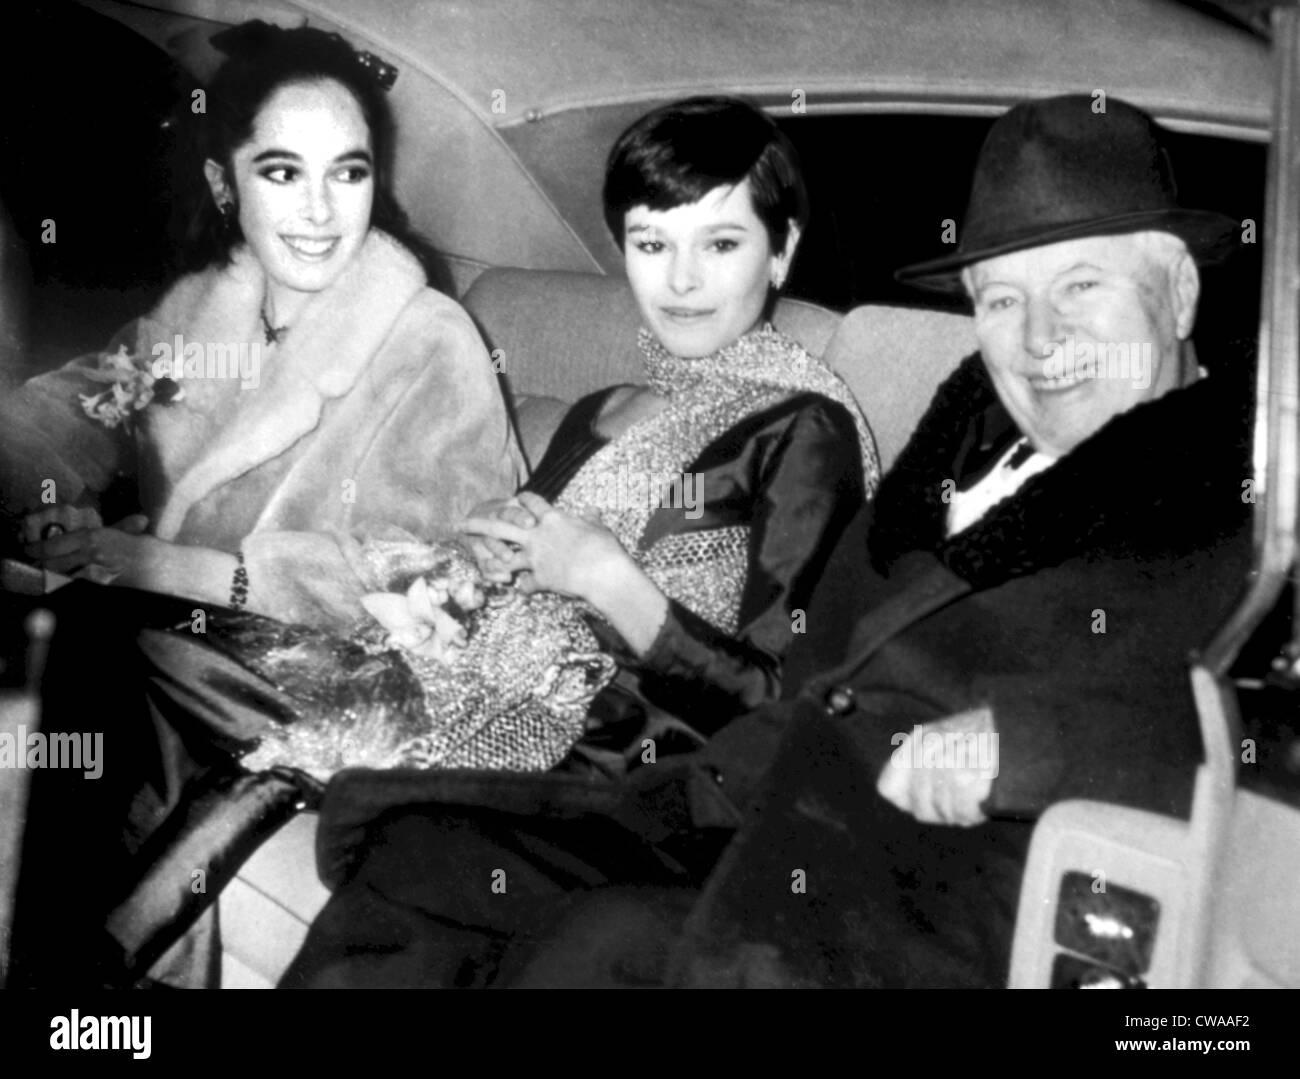 Josephine Chaplin Josephine Chaplin new pictures